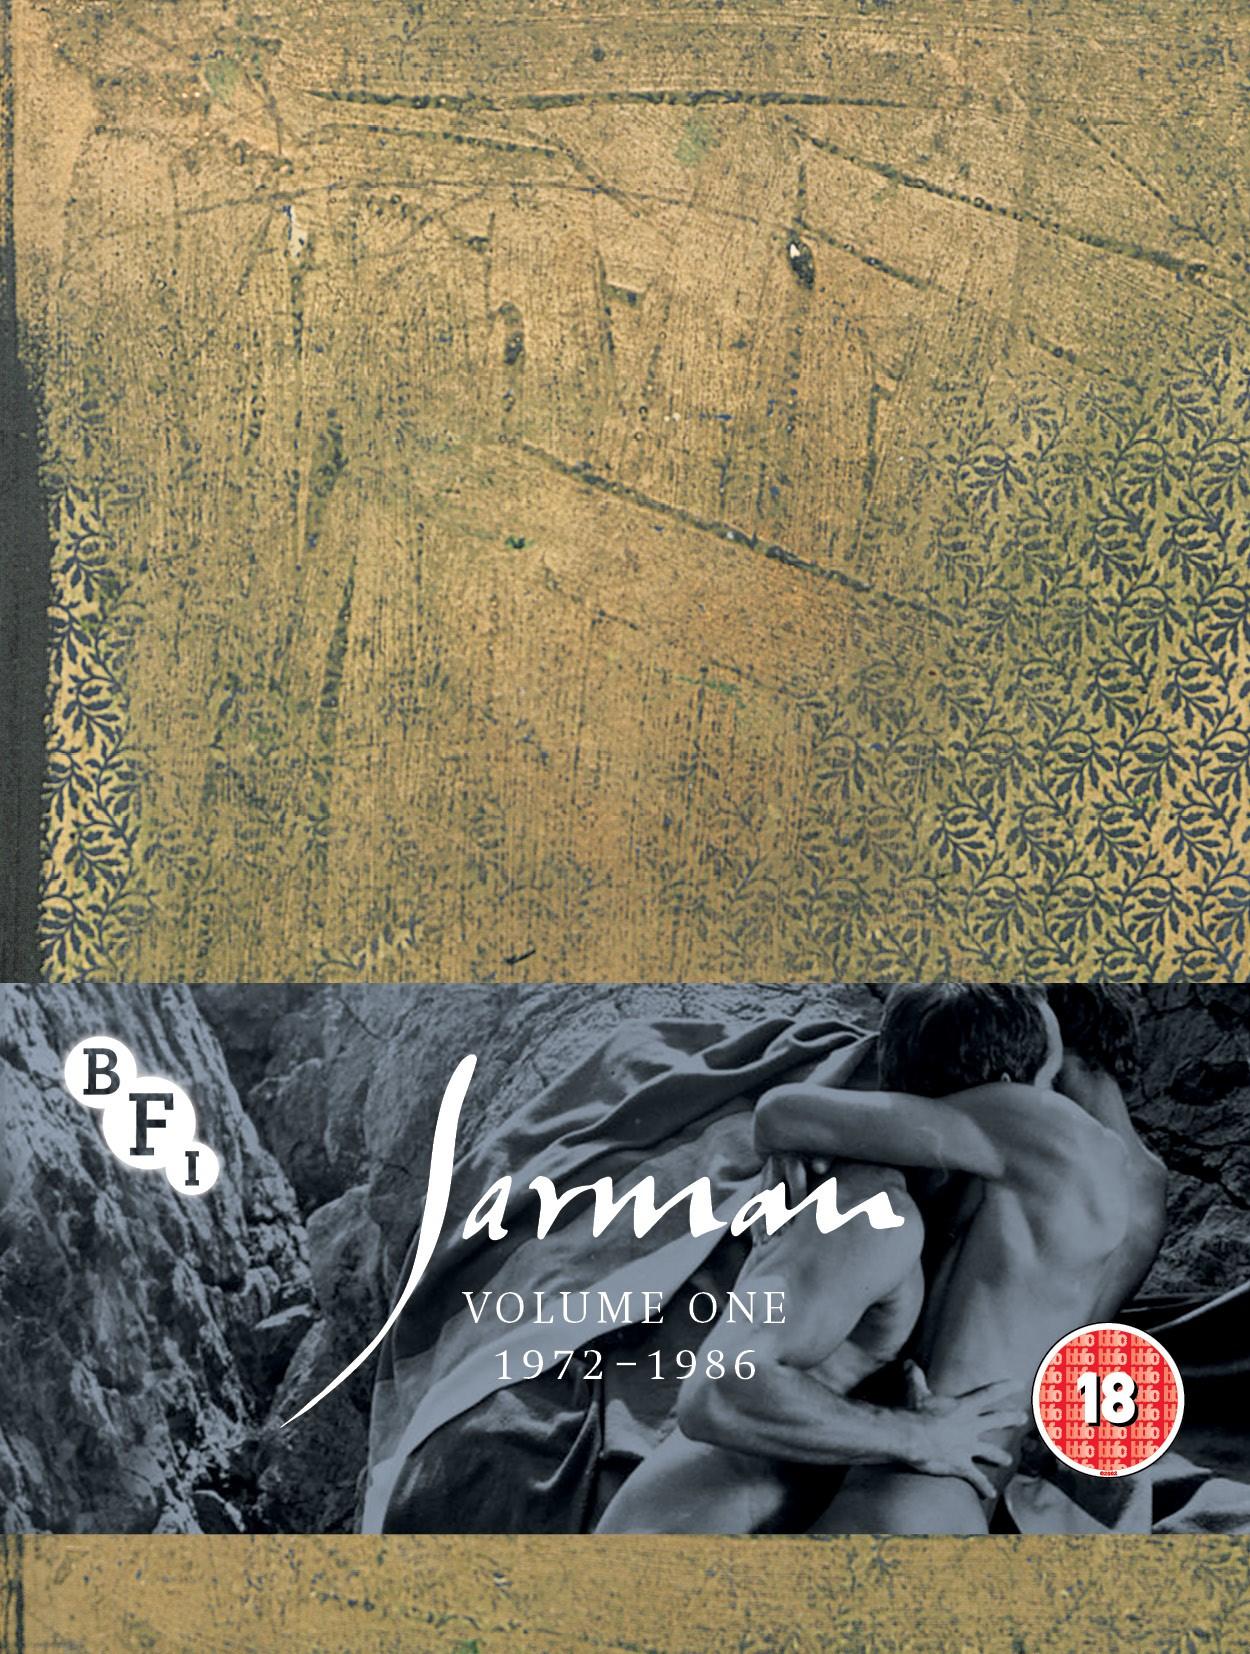 Buy Jarman Volume 1: 1972-1986 (Limited Edition Blu-ray set)